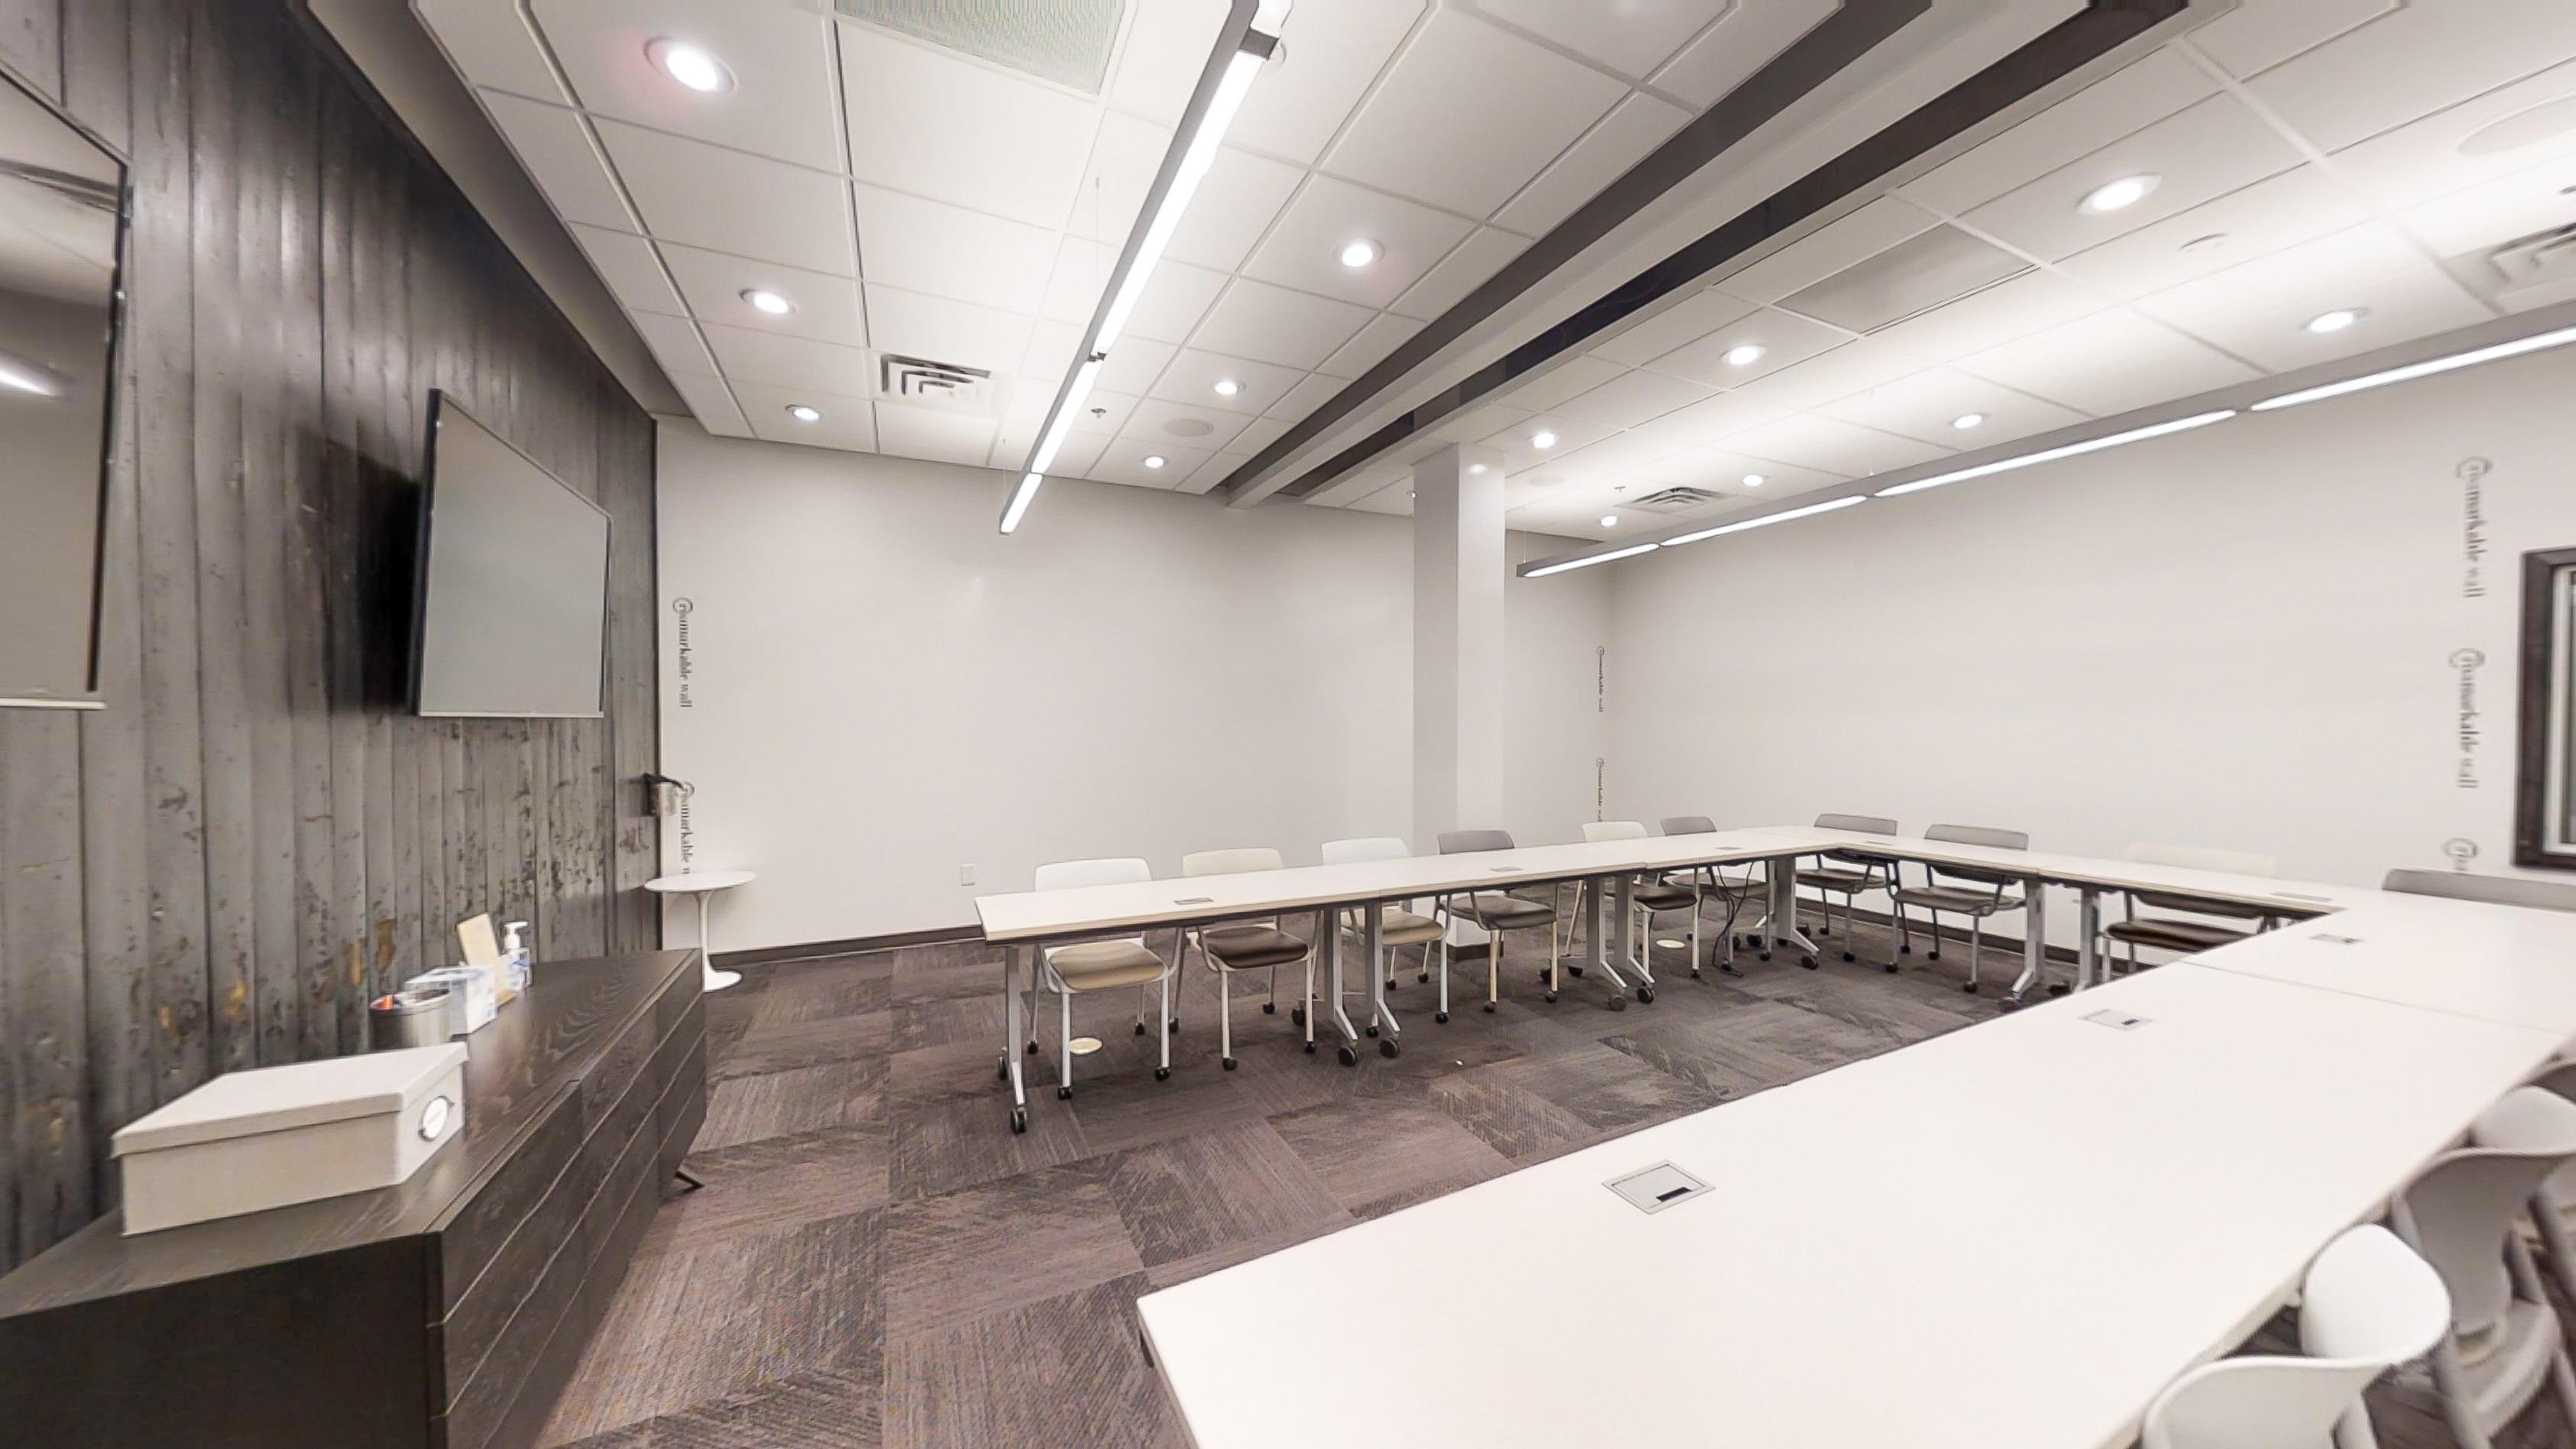 Innovative and inspiring Atlanta training room with whiteboard walls